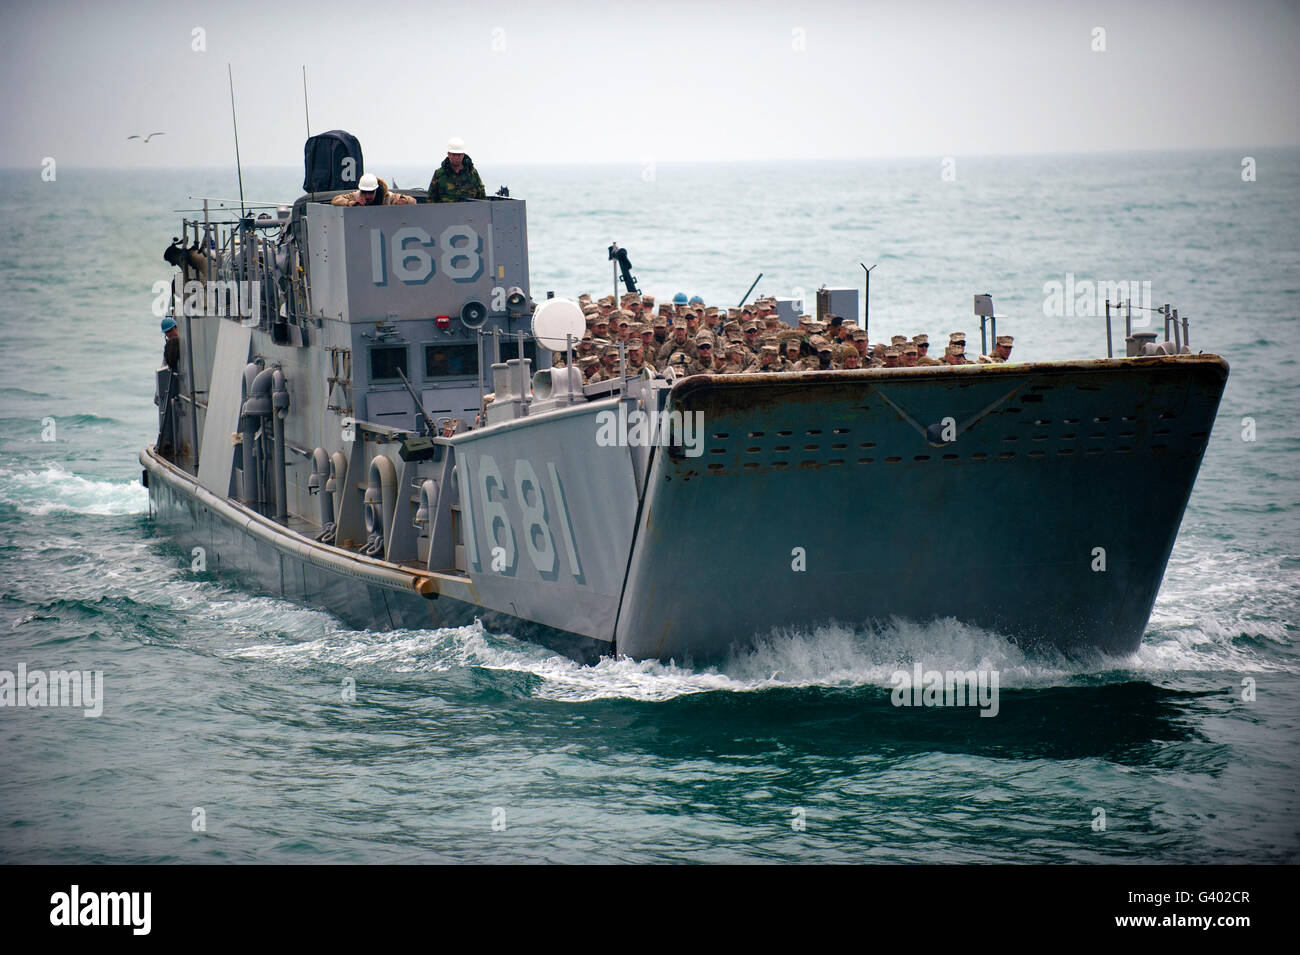 A Landing Craft Utility transits the Arabian Gulf. - Stock Image